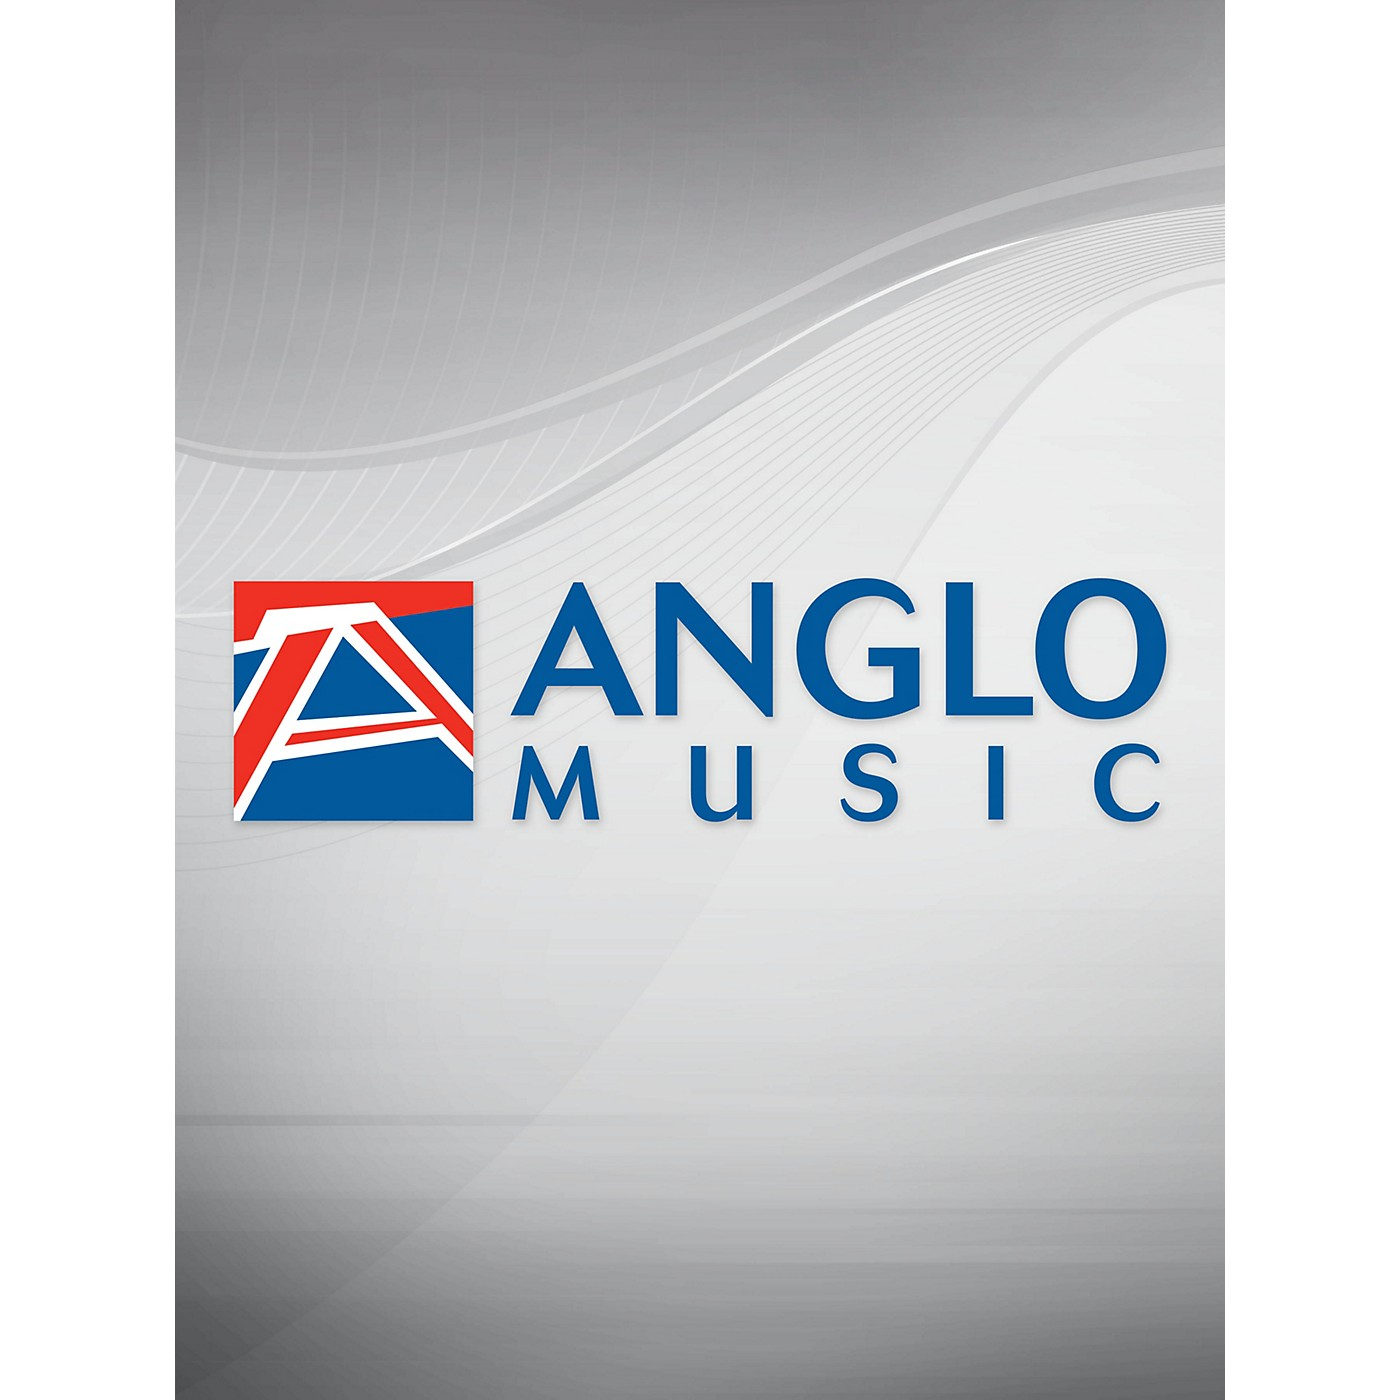 Hal Leonard Look, Listen & Learn - Method Book Part 1 (Baritone/Euphonium (TC)) Anglo Music Press Play-Along Series thumbnail